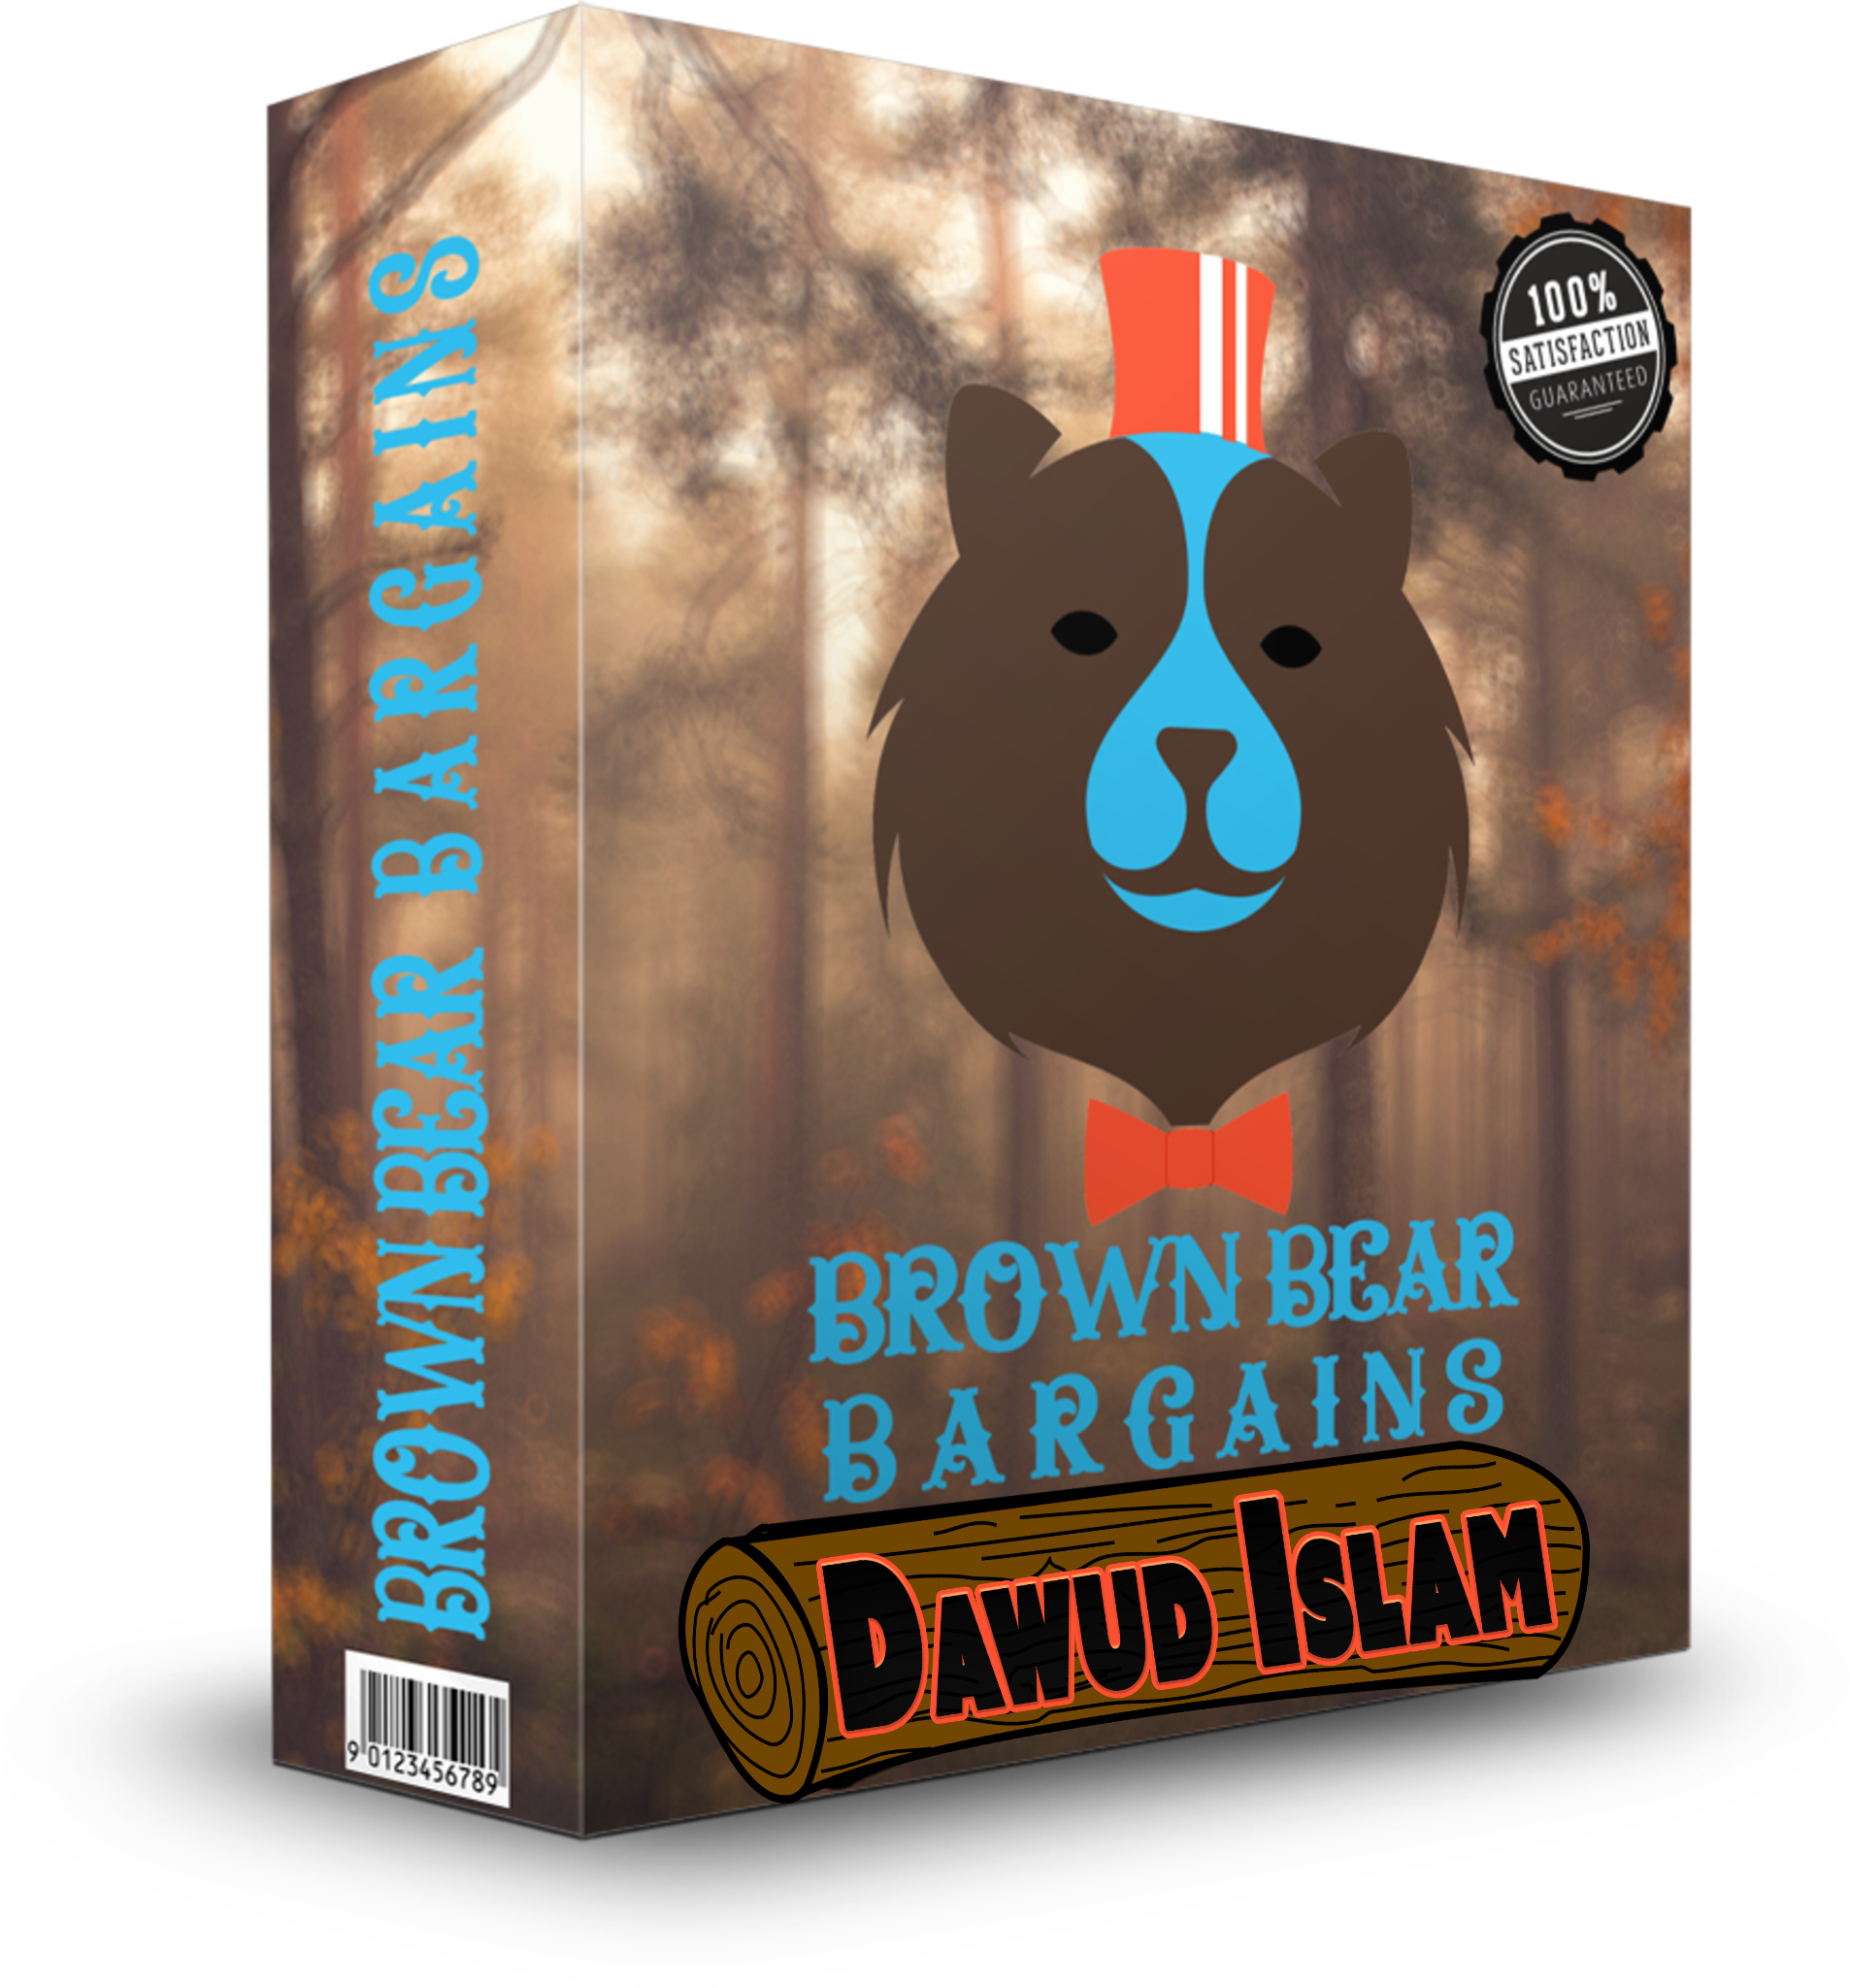 Brown bear bargains